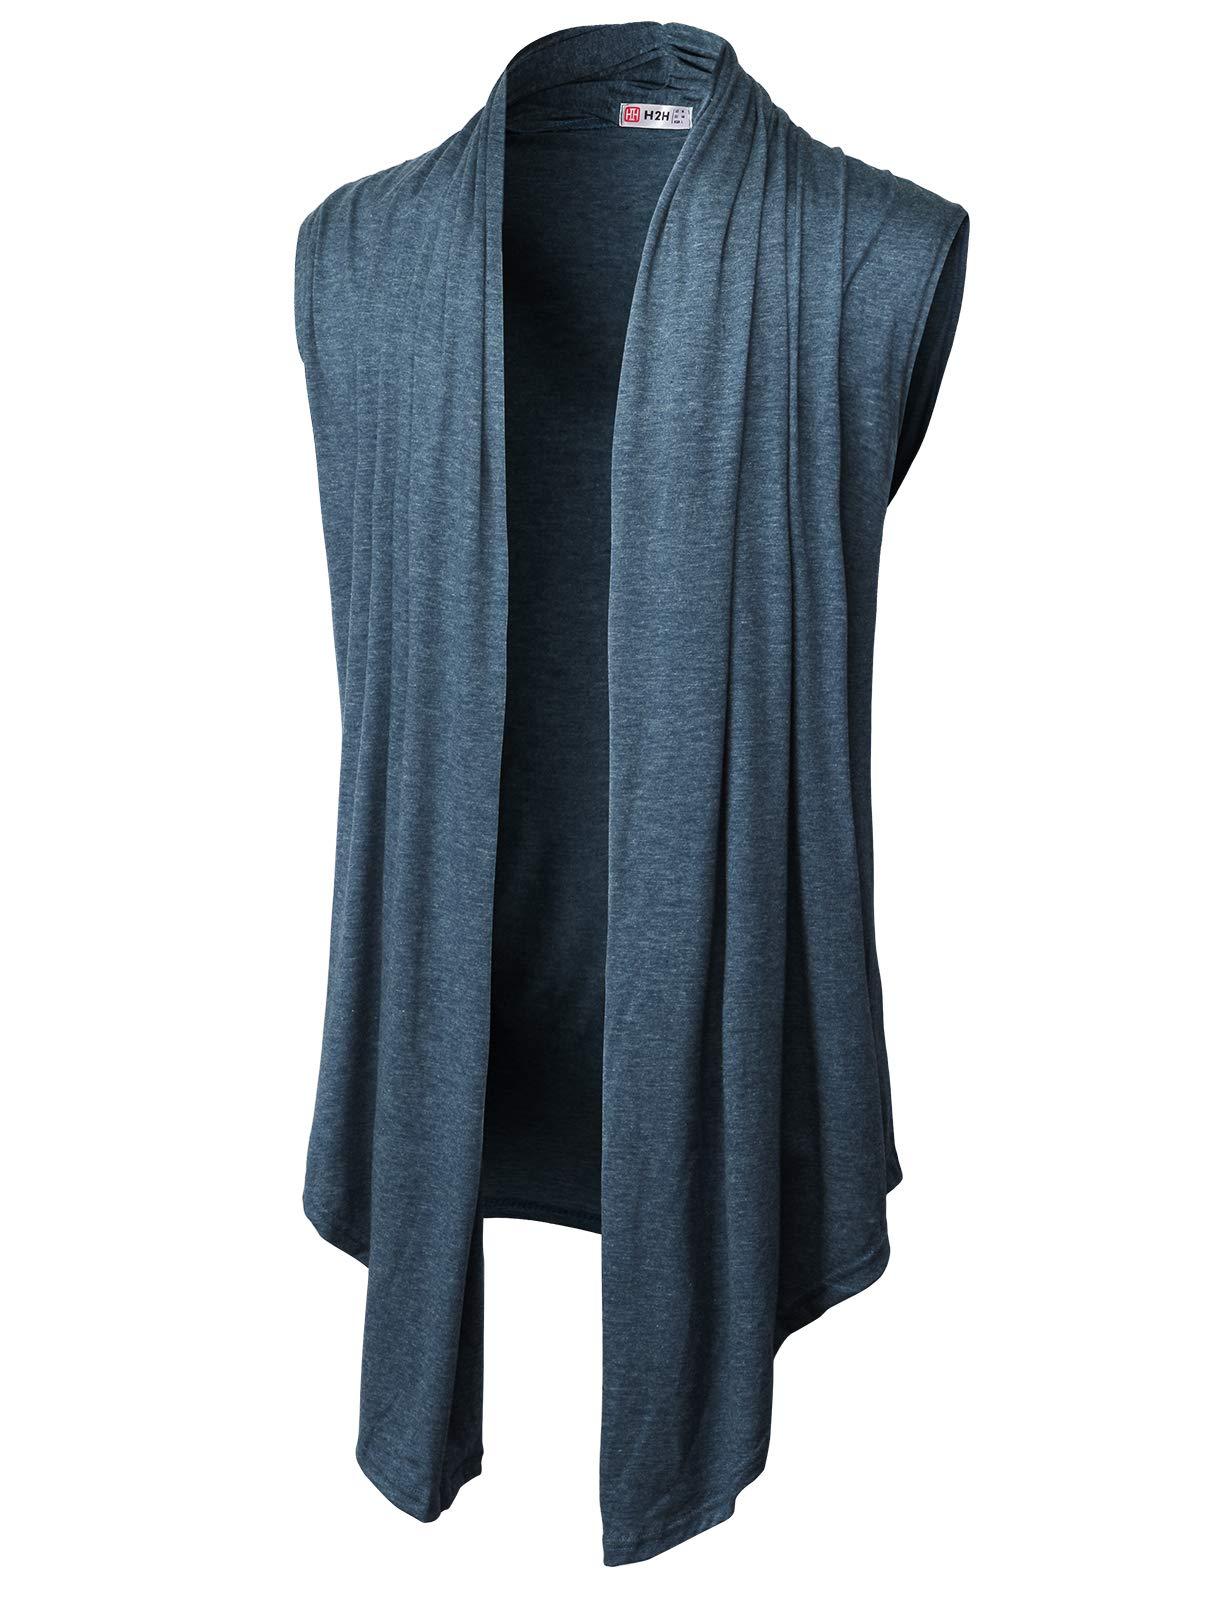 H2H Men's Fashion Shawl Collar Sleeveless Cardigan Lightweight Cotton Long Length Drape Cape Vest HEATHERNAVY US S/Asia M (CMOCASL01)